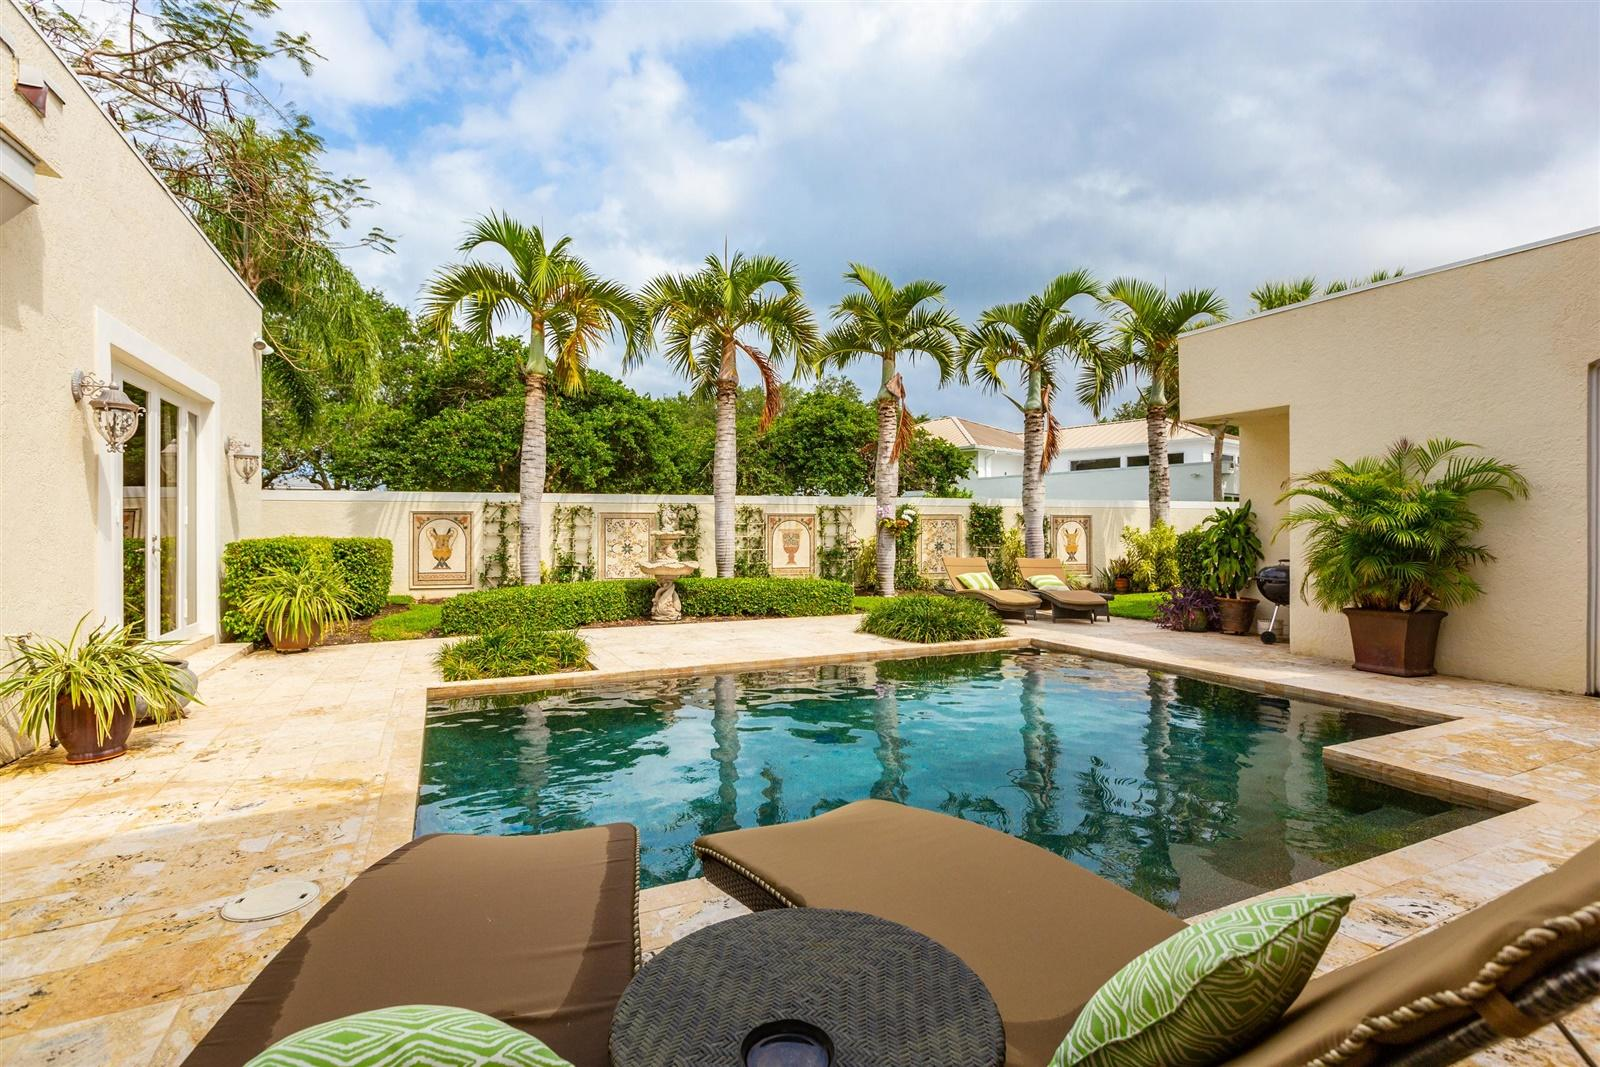 117 Waters Edge Drive, Jupiter, Florida 33477, 4 Bedrooms Bedrooms, ,4.1 BathroomsBathrooms,A,Villa,Waters Edge,RX-10617087